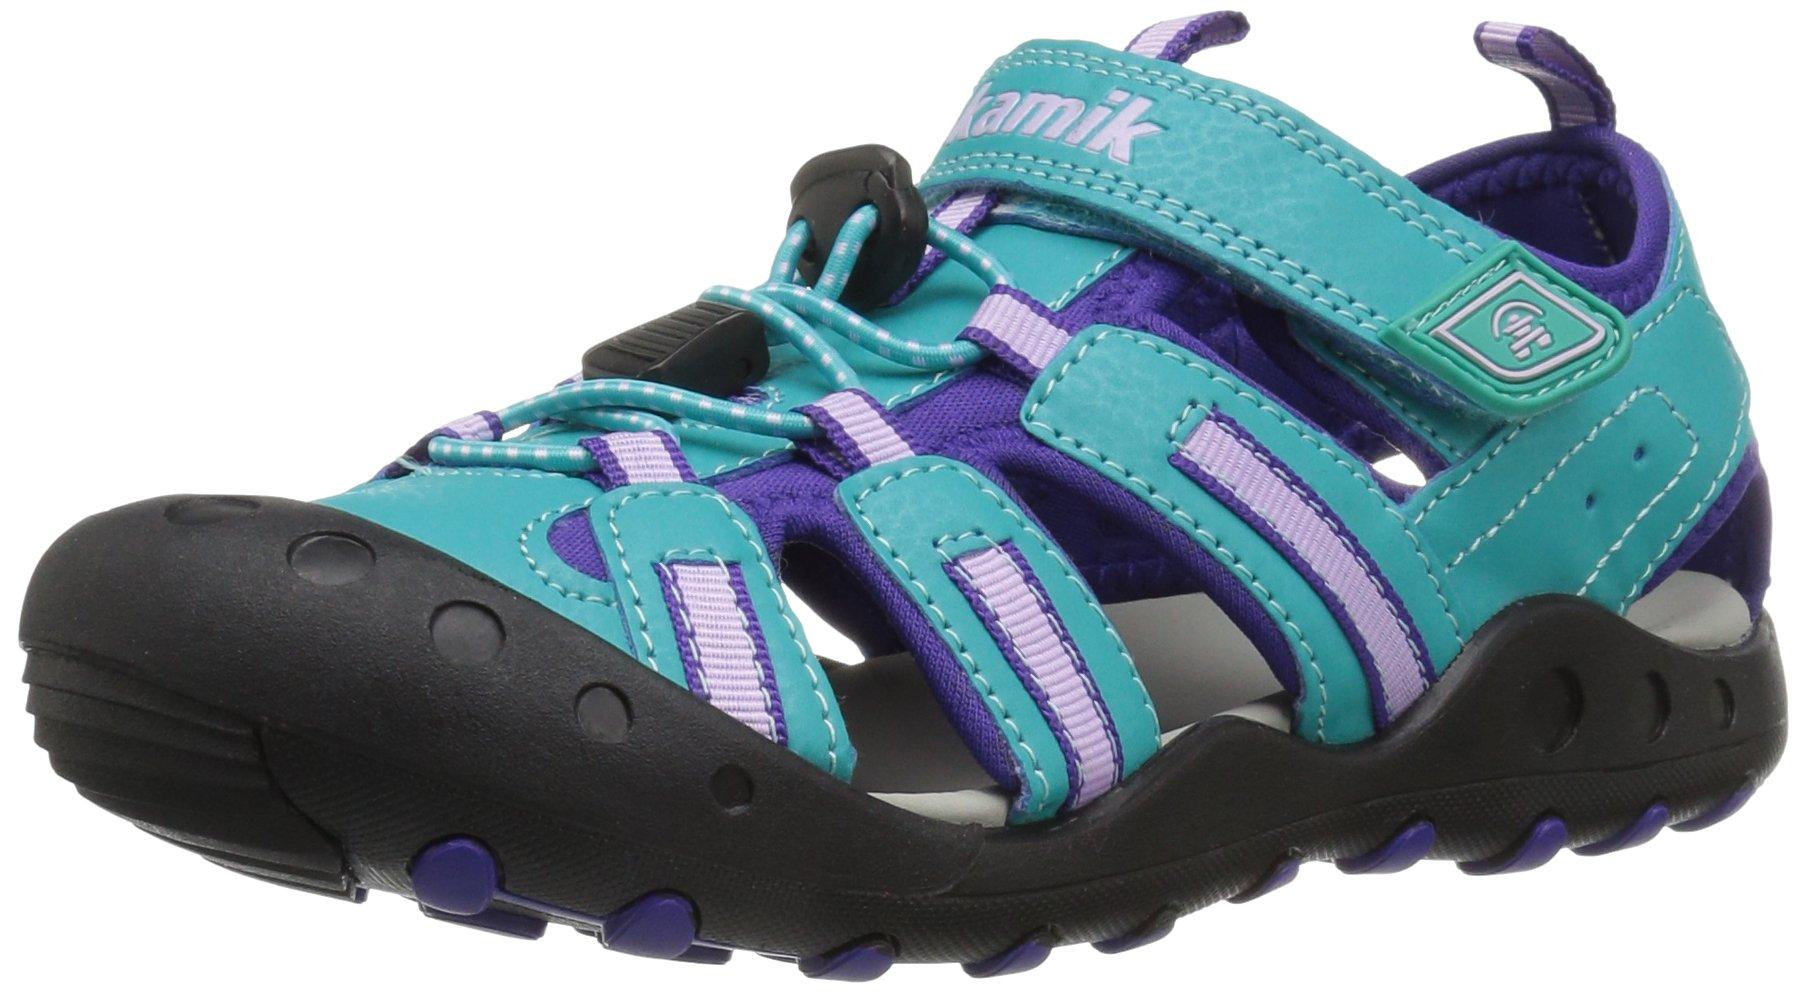 Kamik Girls' Crab Water Shoe, Teal, 12 M US Little Kid